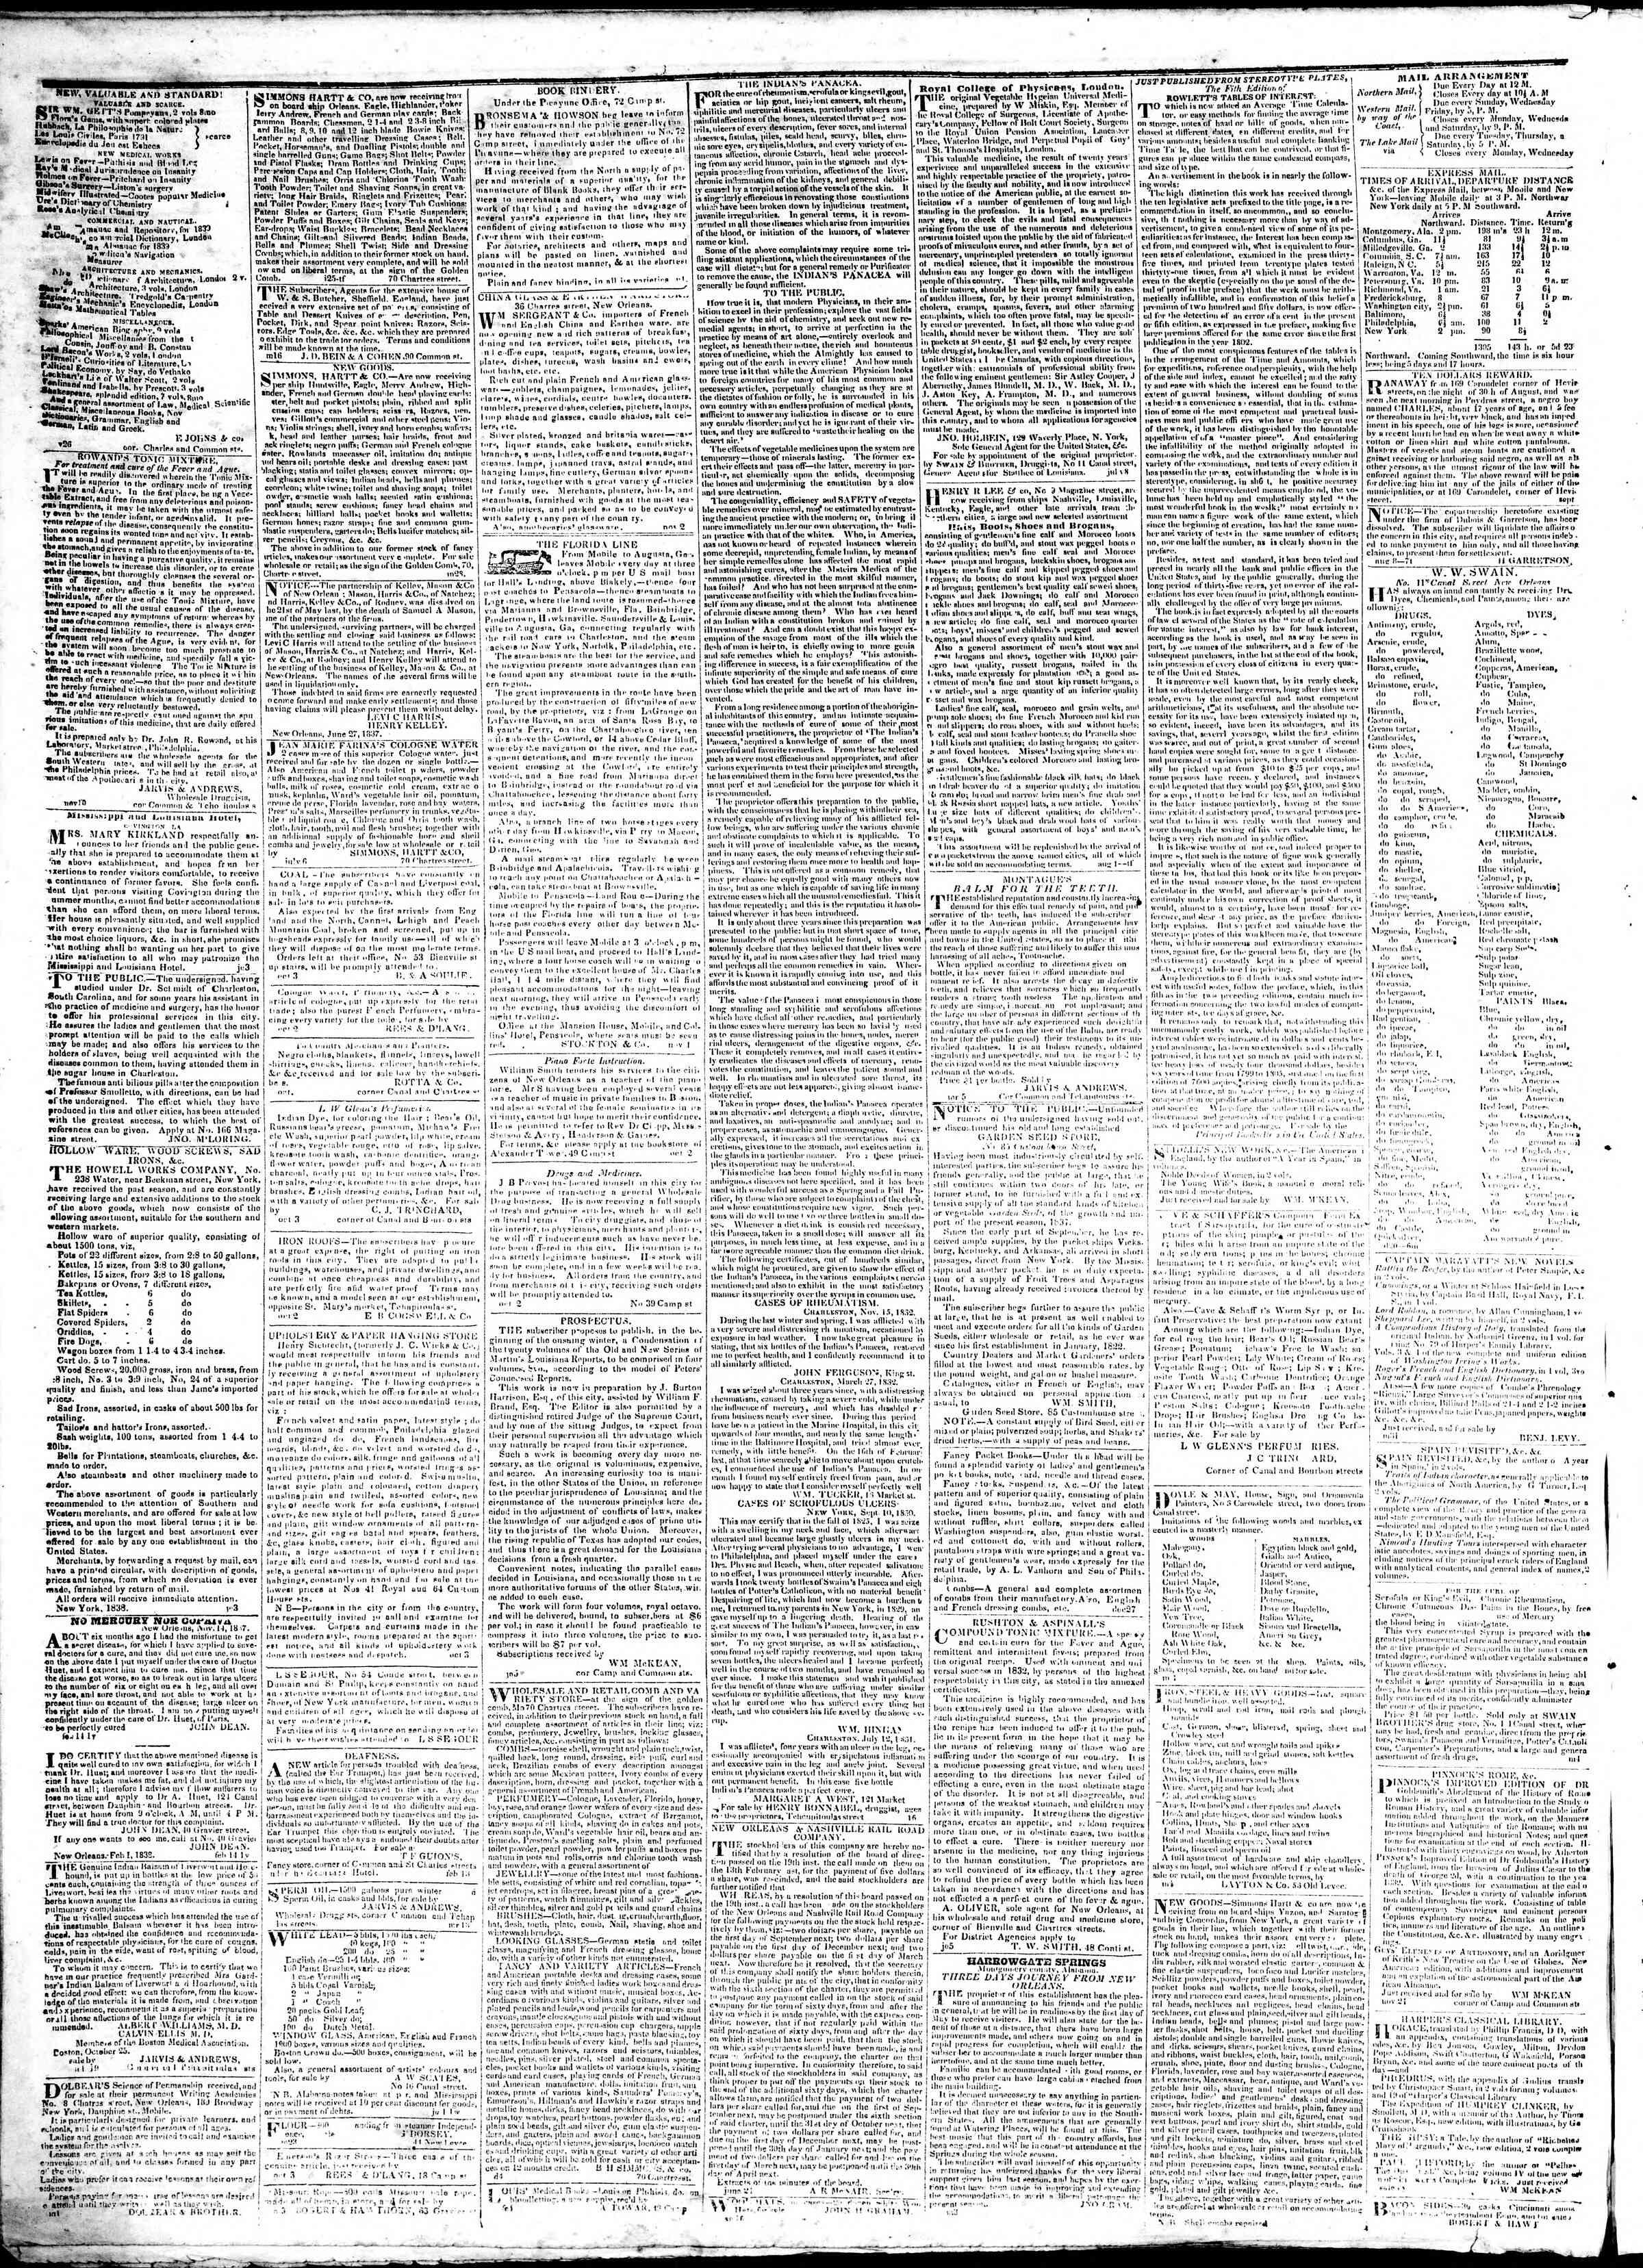 February 16, 1839 Tarihli True American Gazetesi Sayfa 4